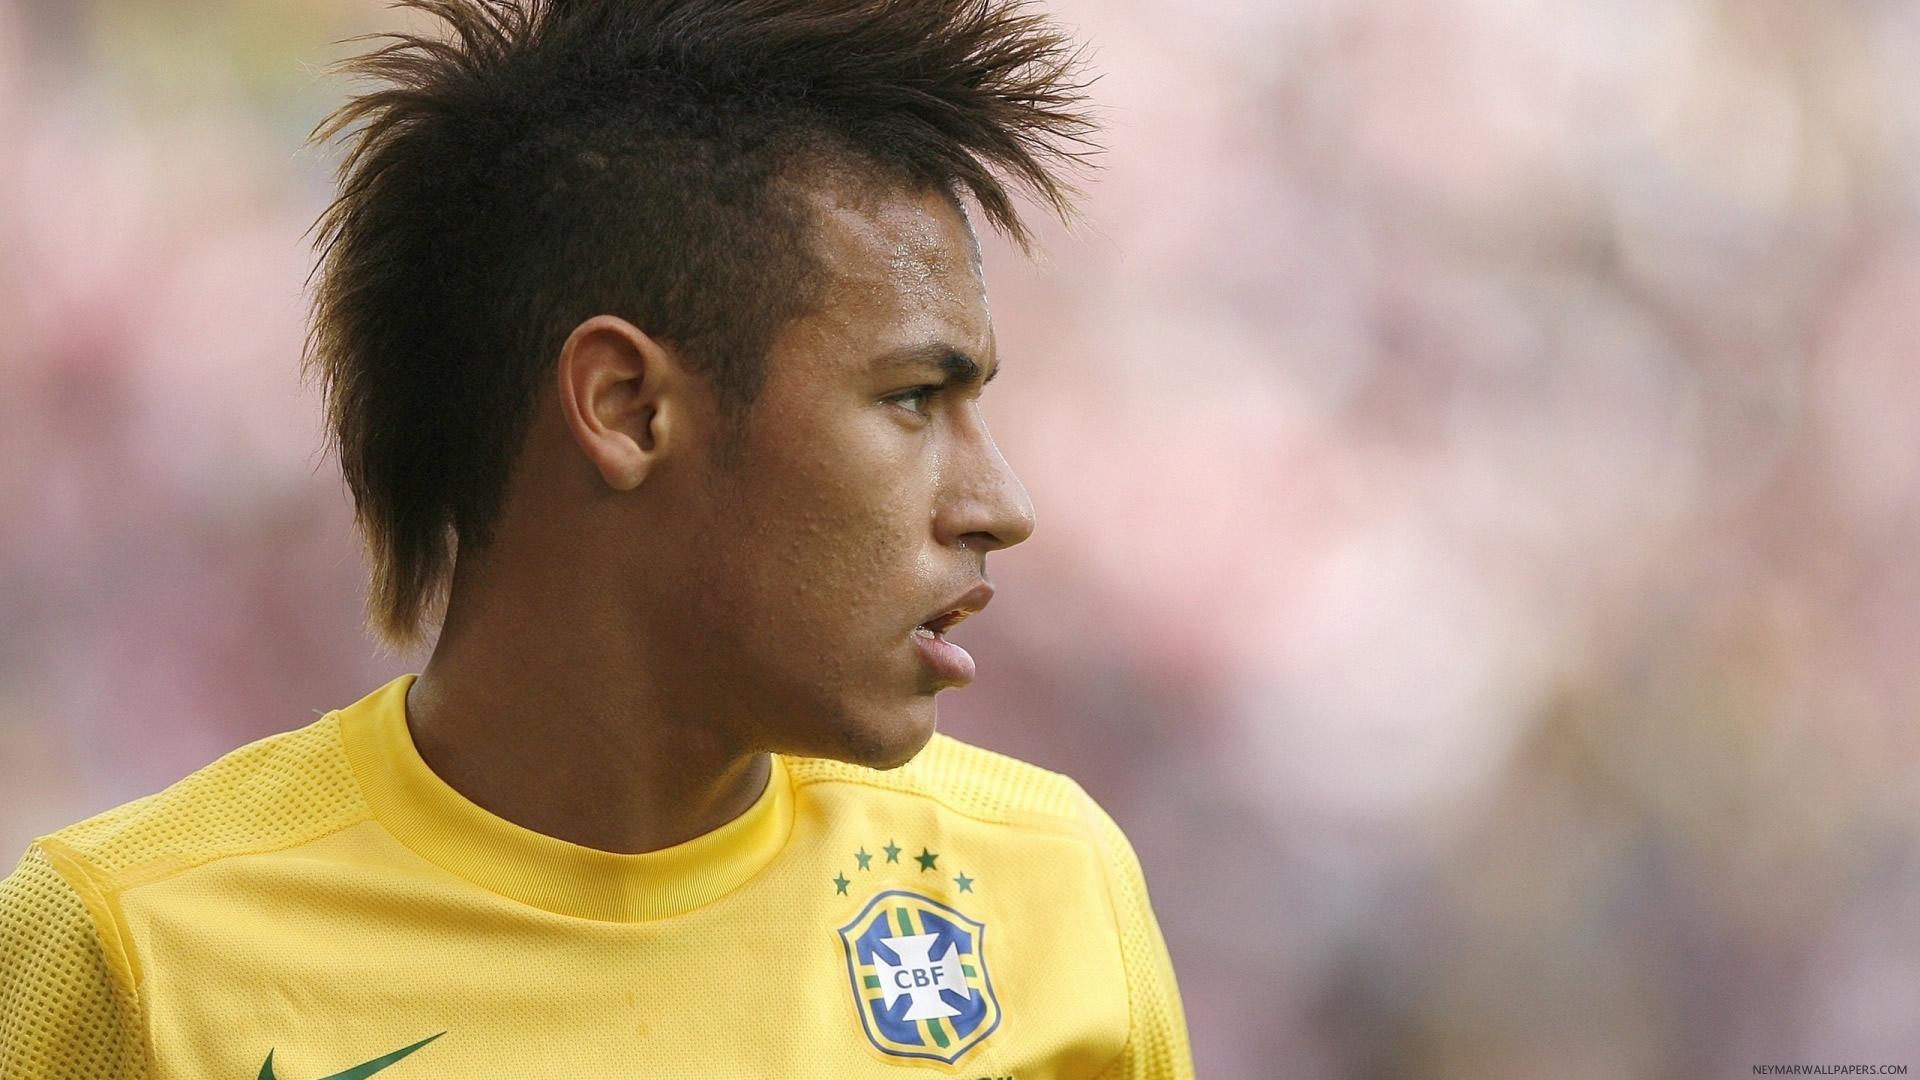 Neymar head wallpaper (5)